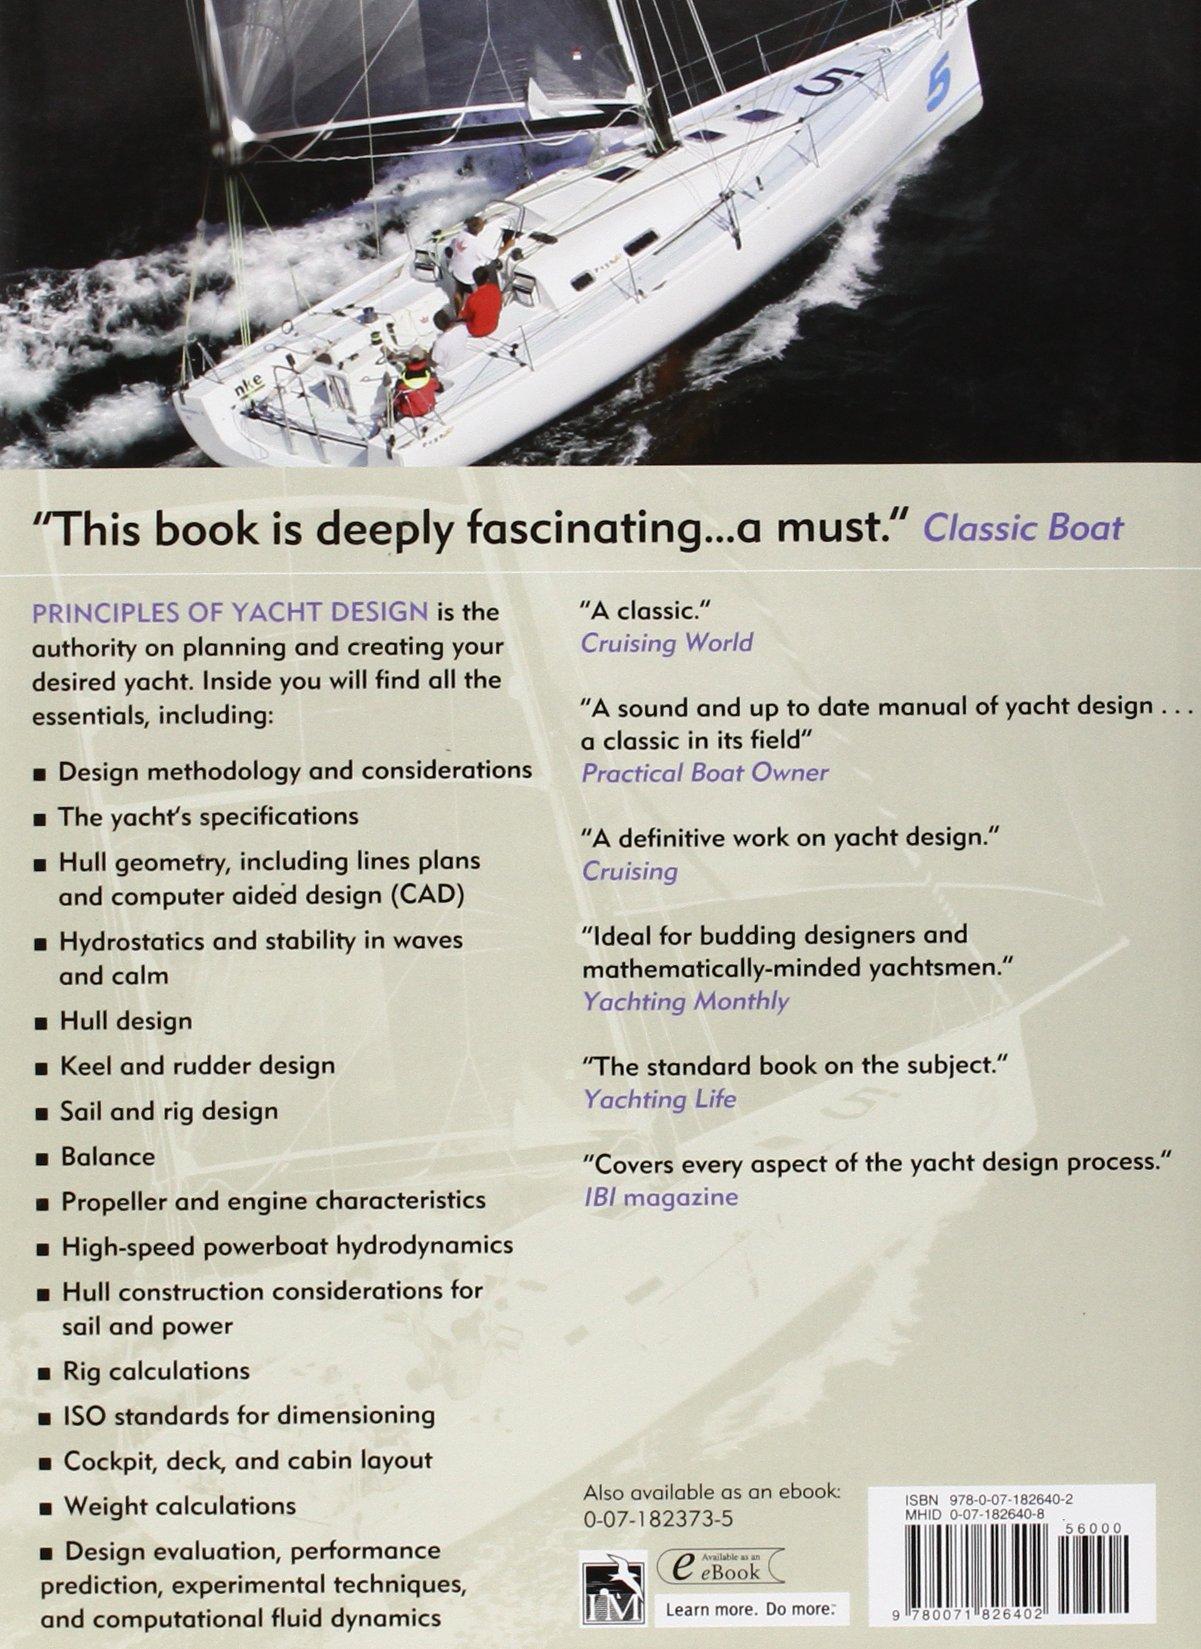 Principles of Yacht Design by International Marine/Ragged Mountain Press